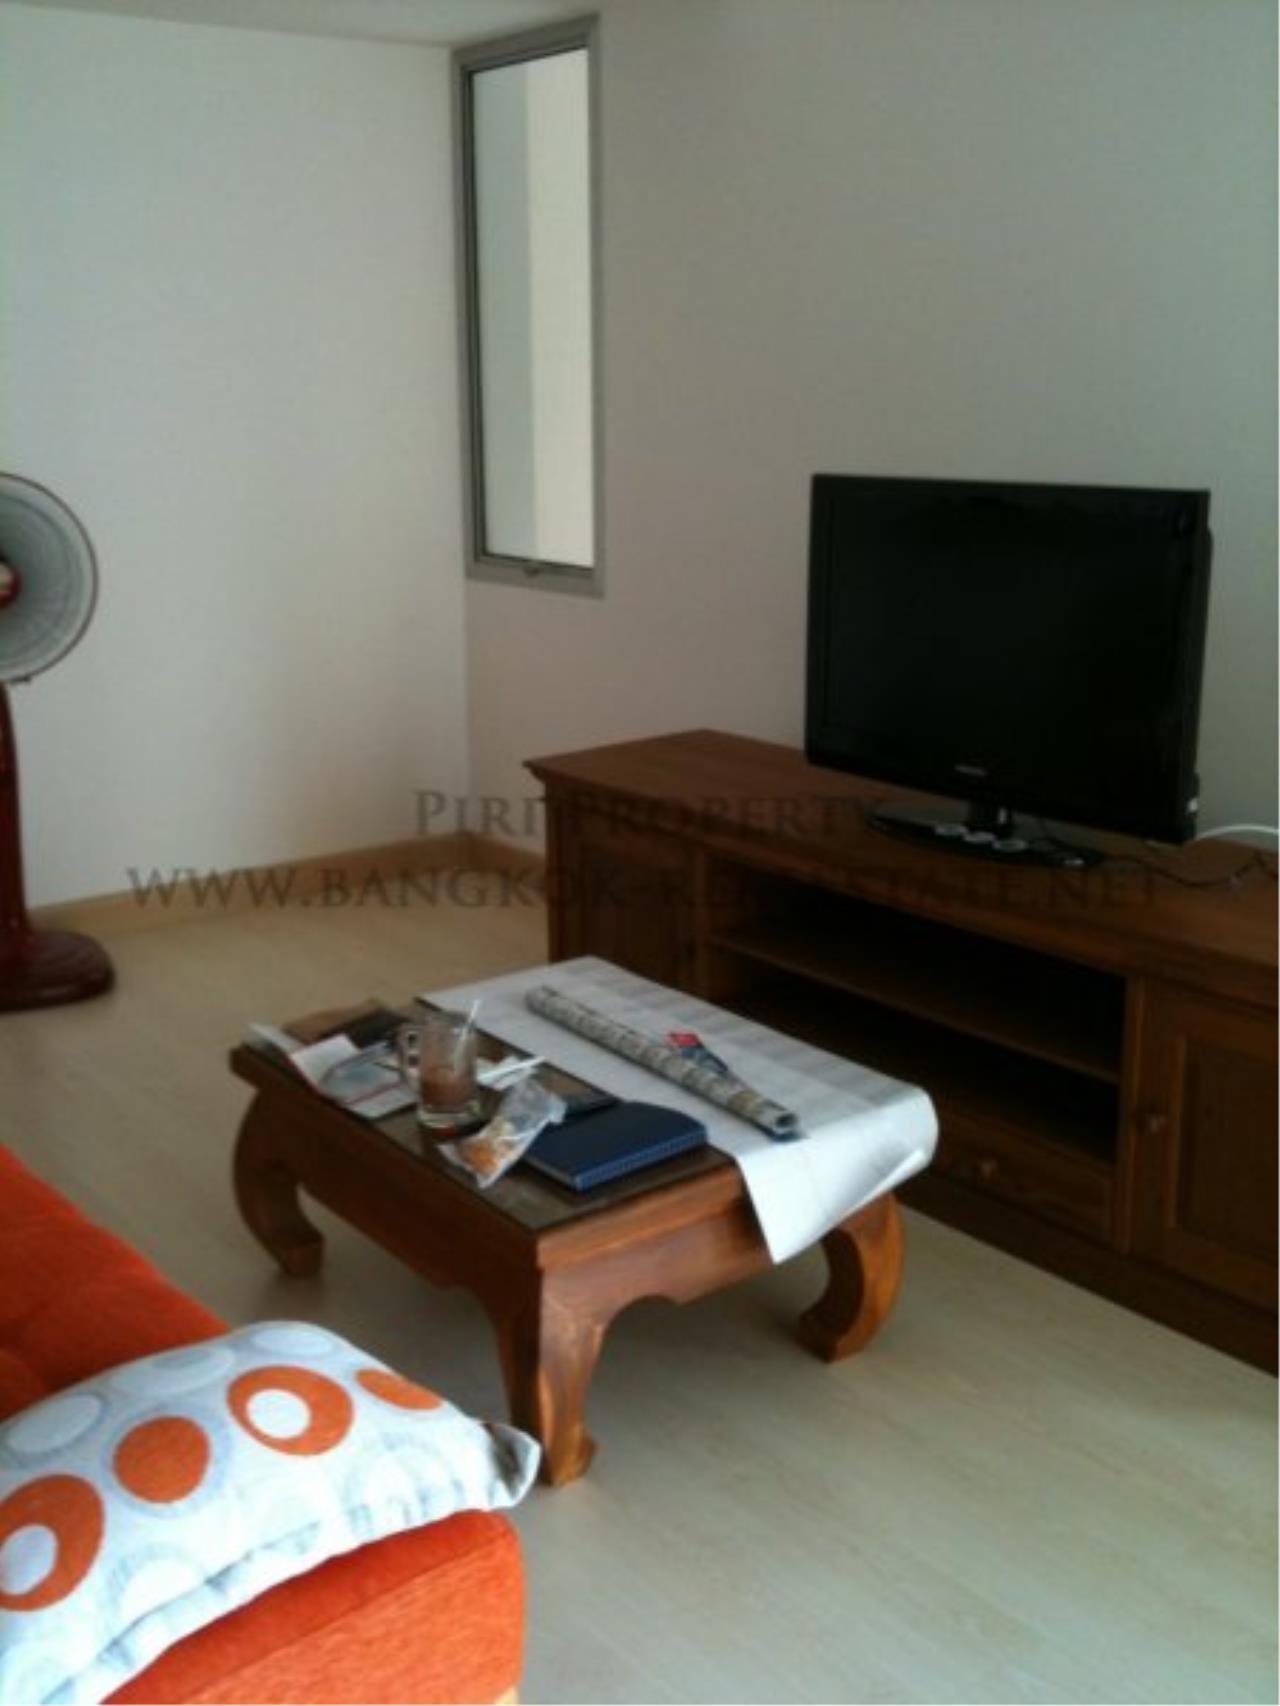 Piri Property Agency's My Resort Bangkok - Condo on 19th Floor for rent 2